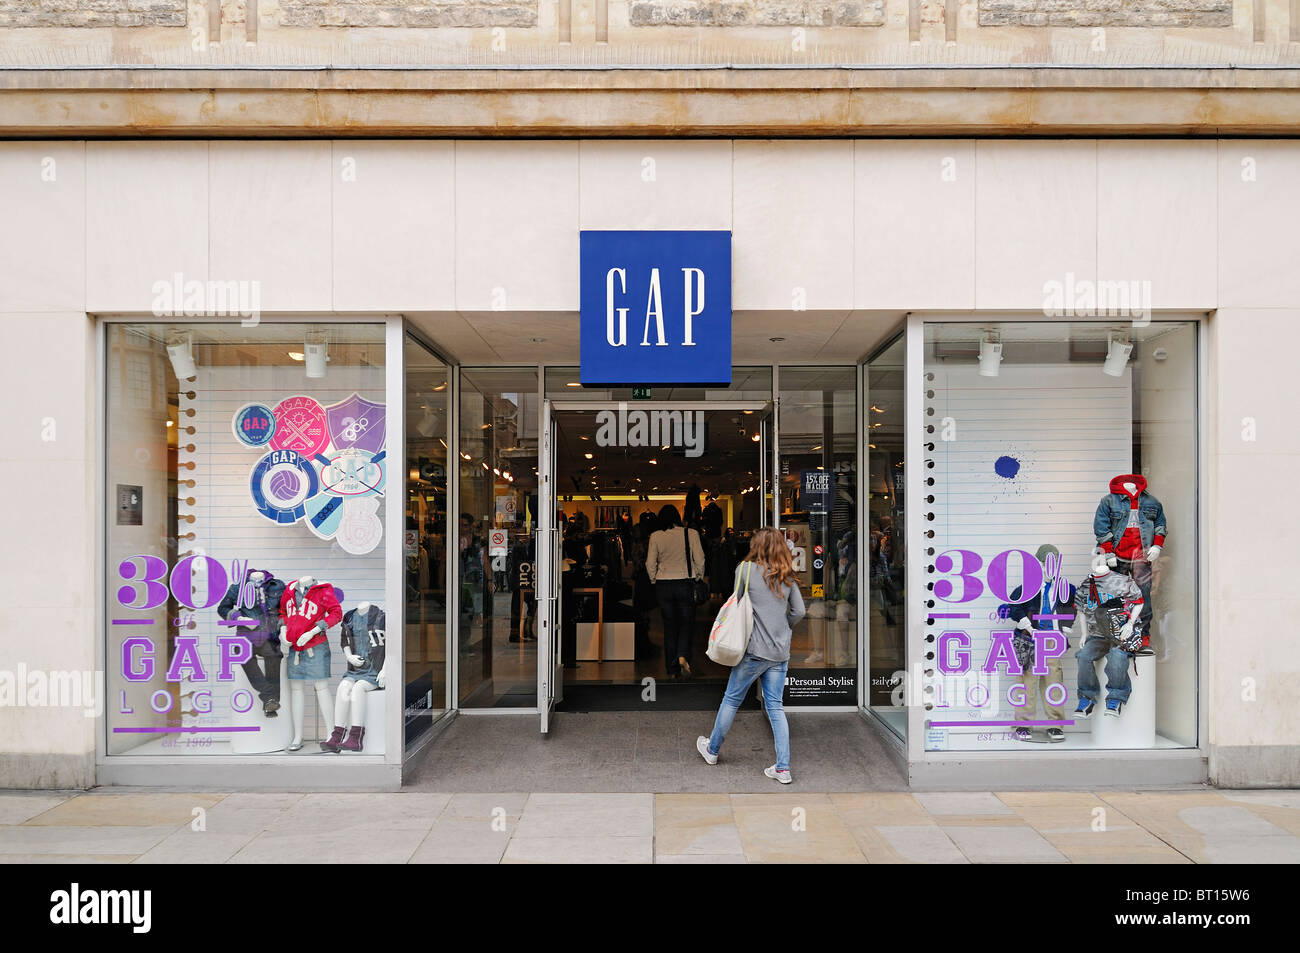 GAP Shop, Oxford, UK. - Stock Image